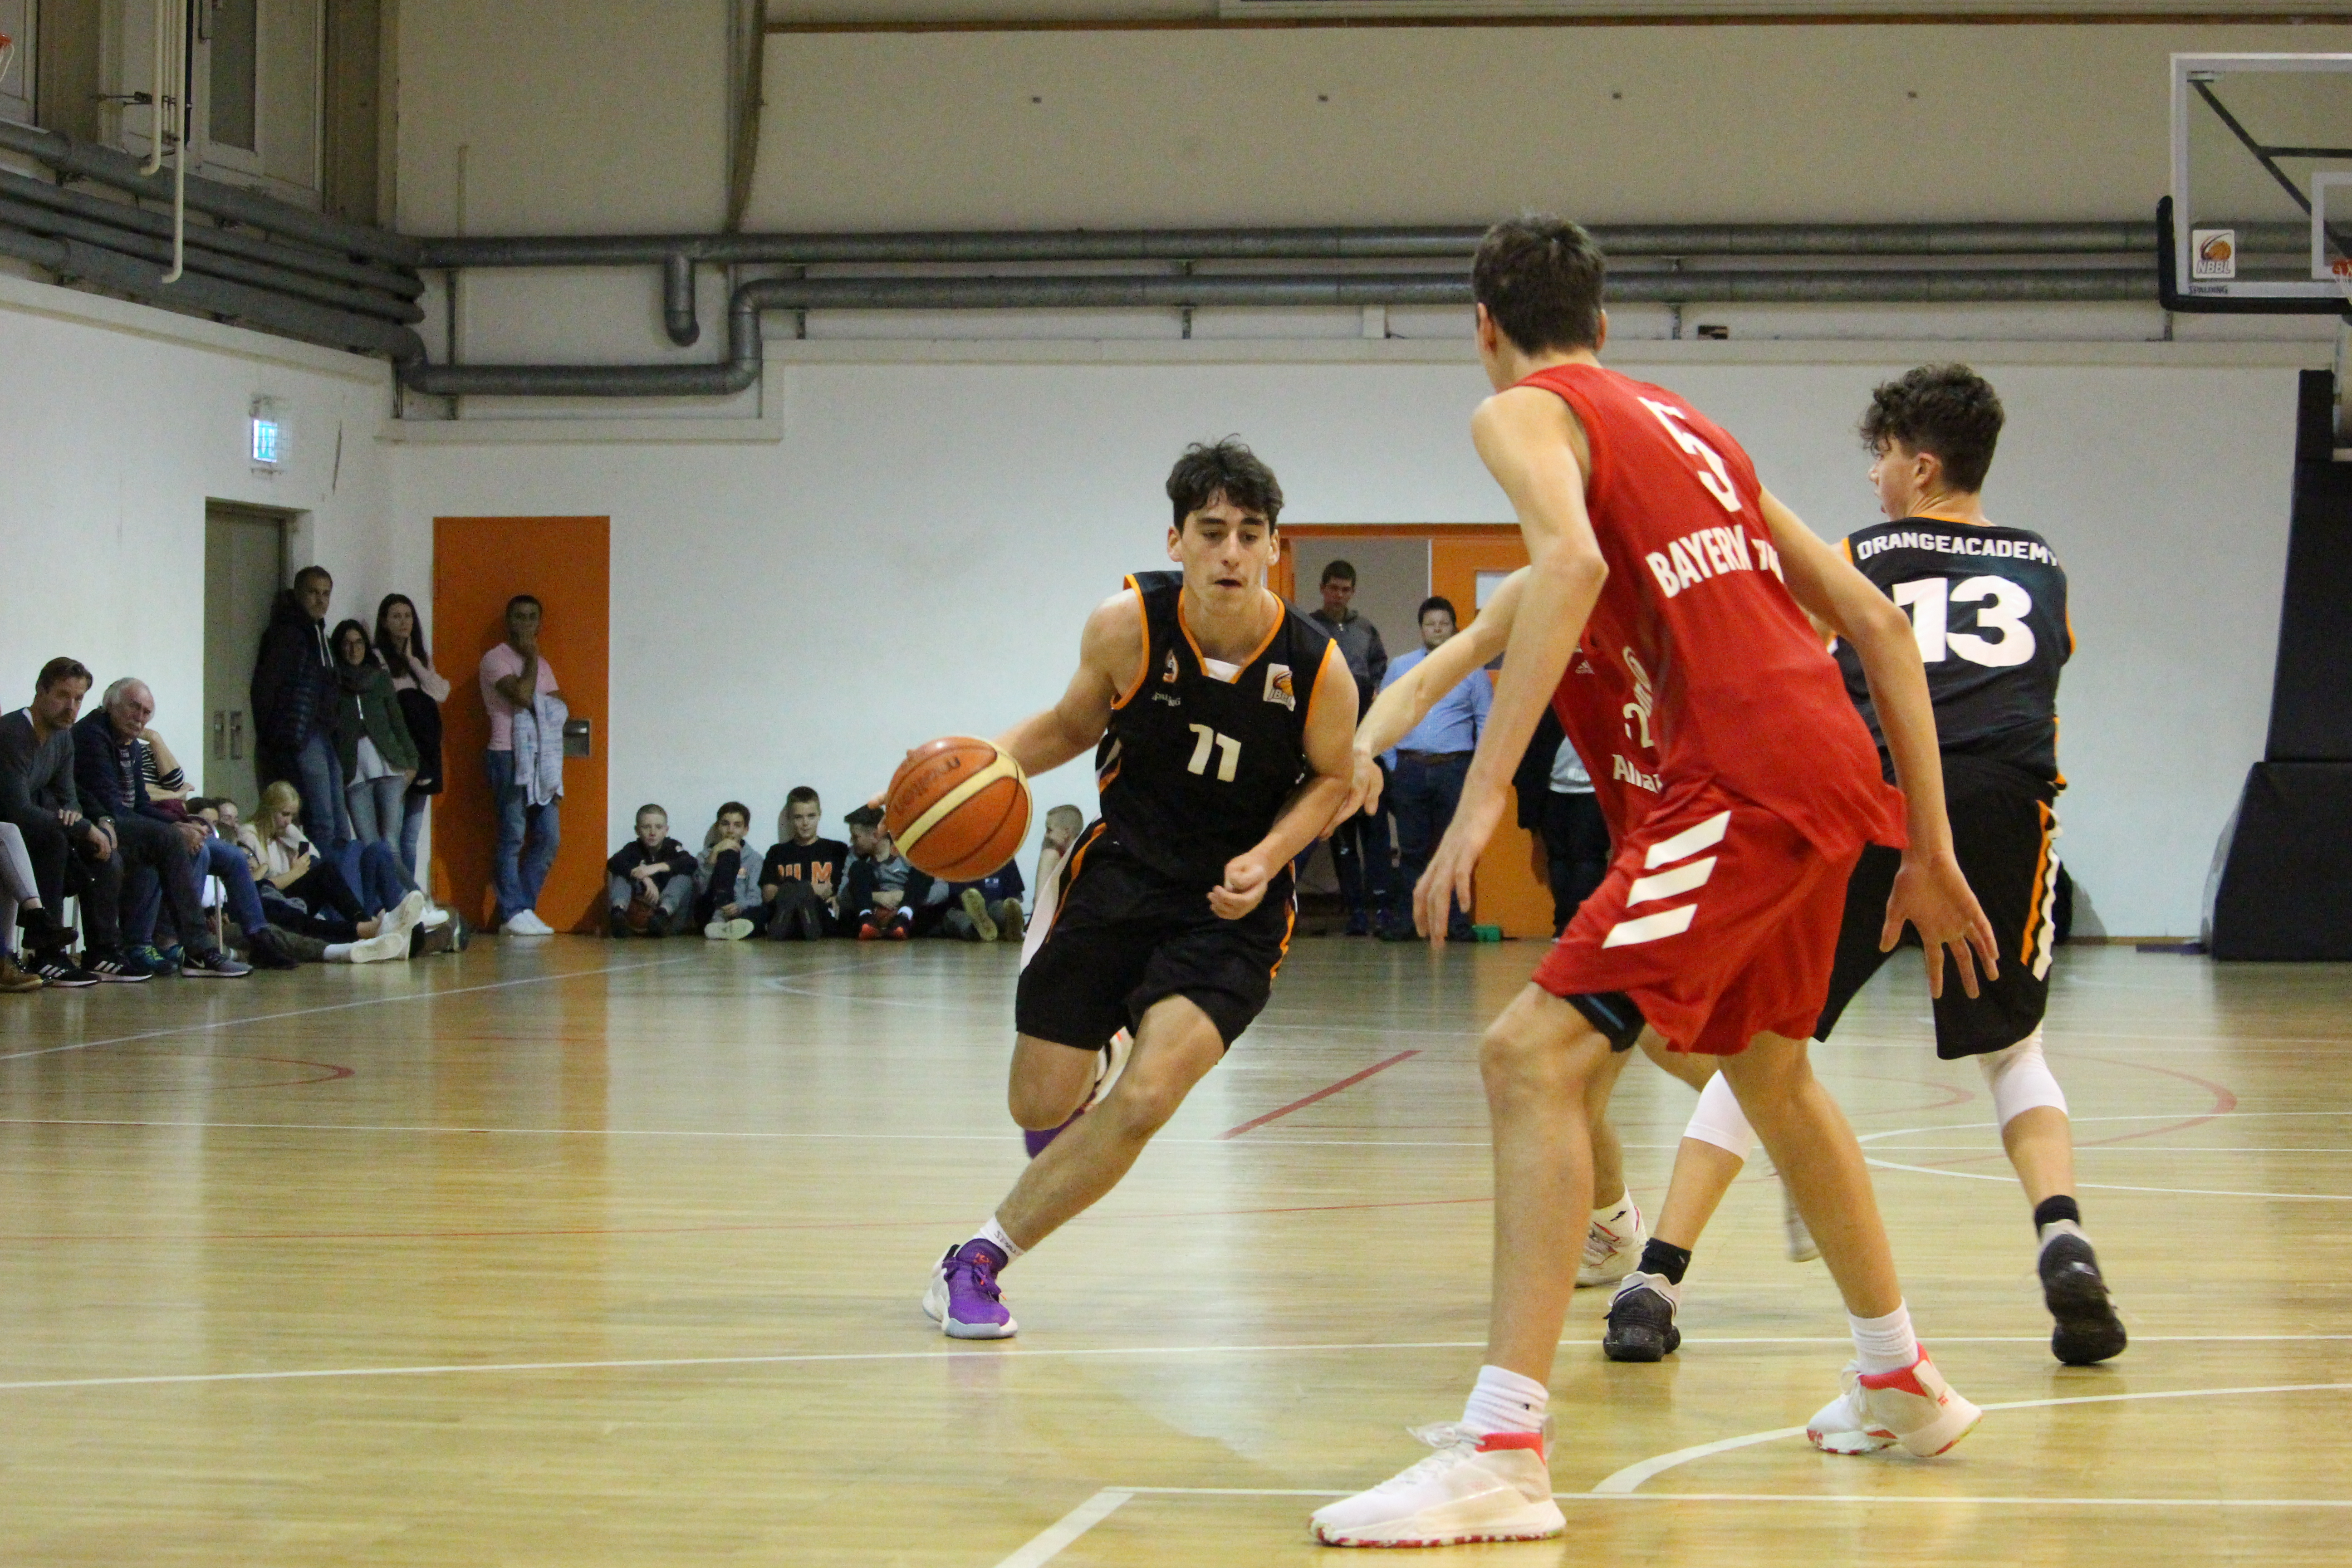 JBBL_19-20_OrangeAcademy_FC-Bayern-München-Basketball_Spieltag7_Jon-Ukaj